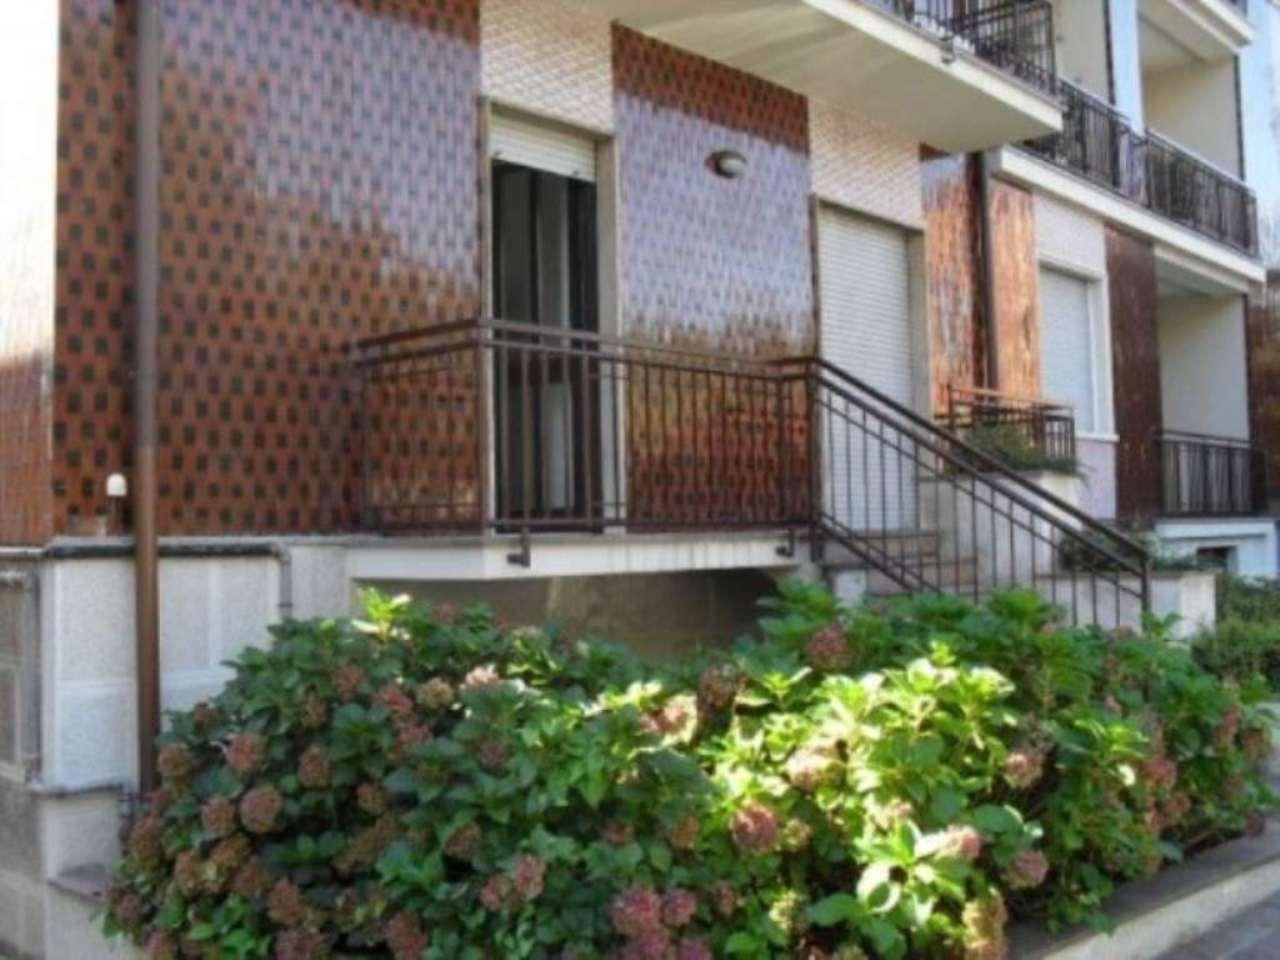 Immobili commerciali in affitto a cinisello balsamo for Immobili commerciali in affitto a roma